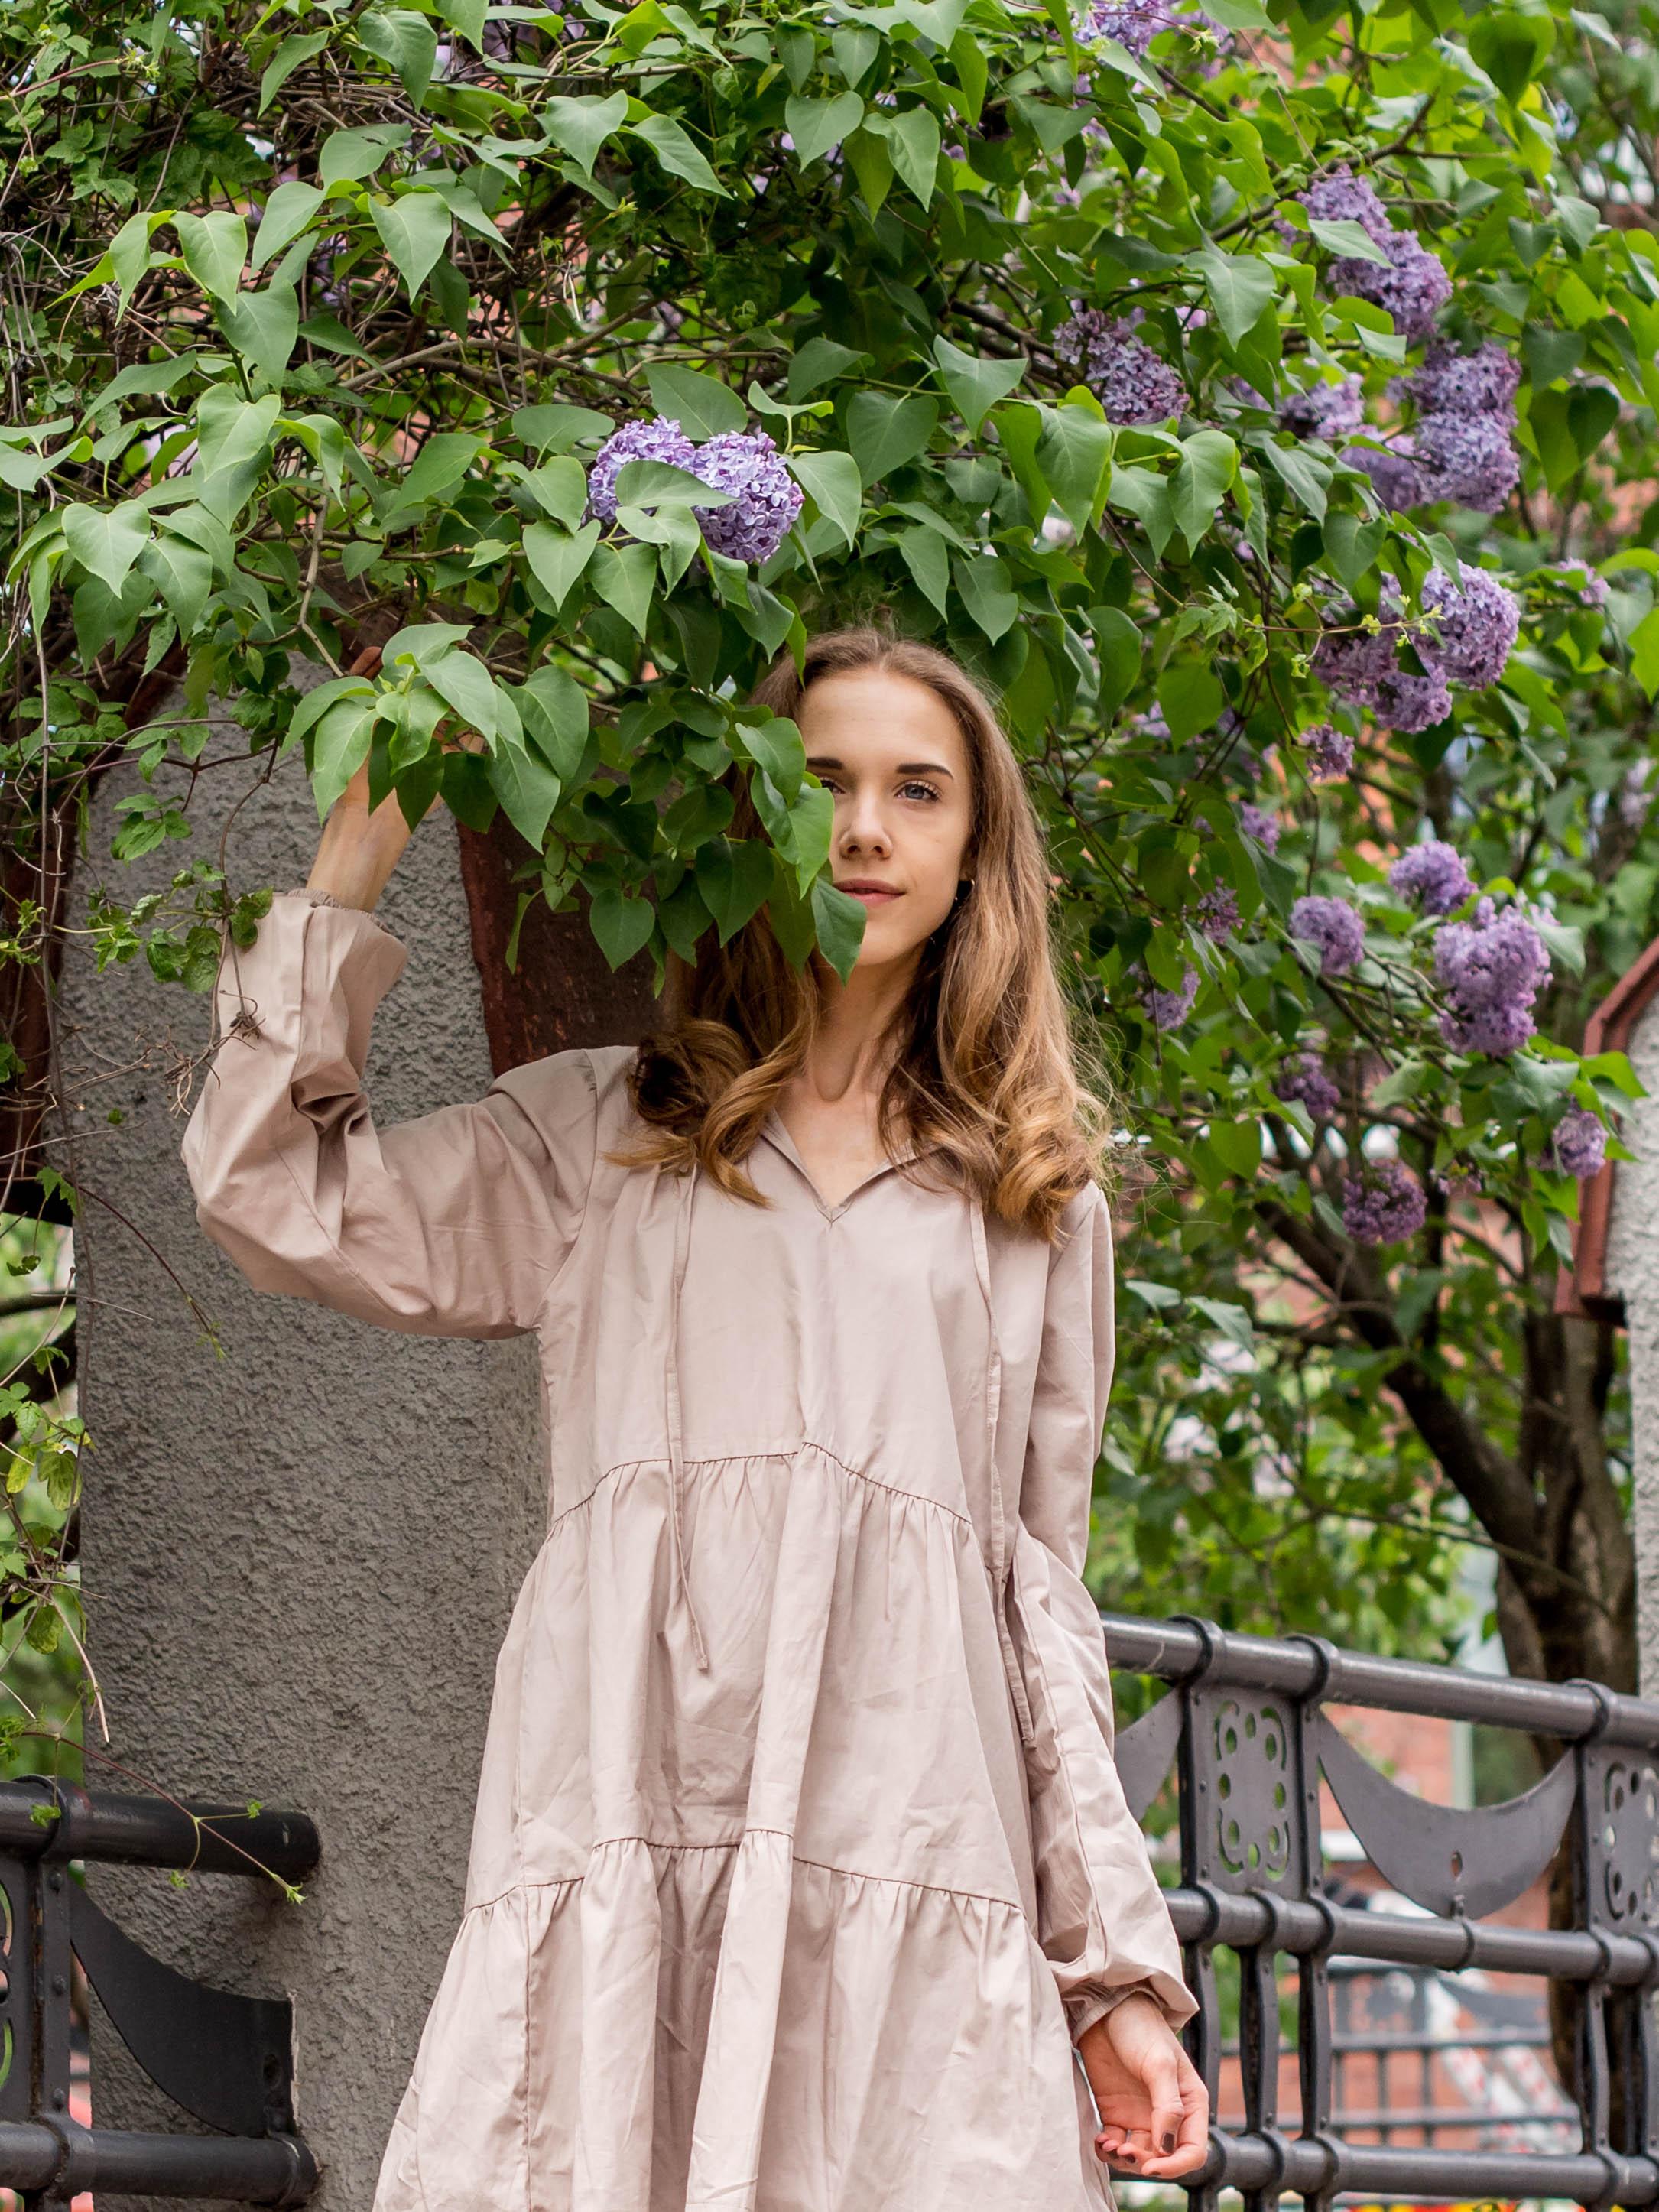 Beige smock dress, summer fashion 2020 - Beige paitamekko, kesämuoti 2020